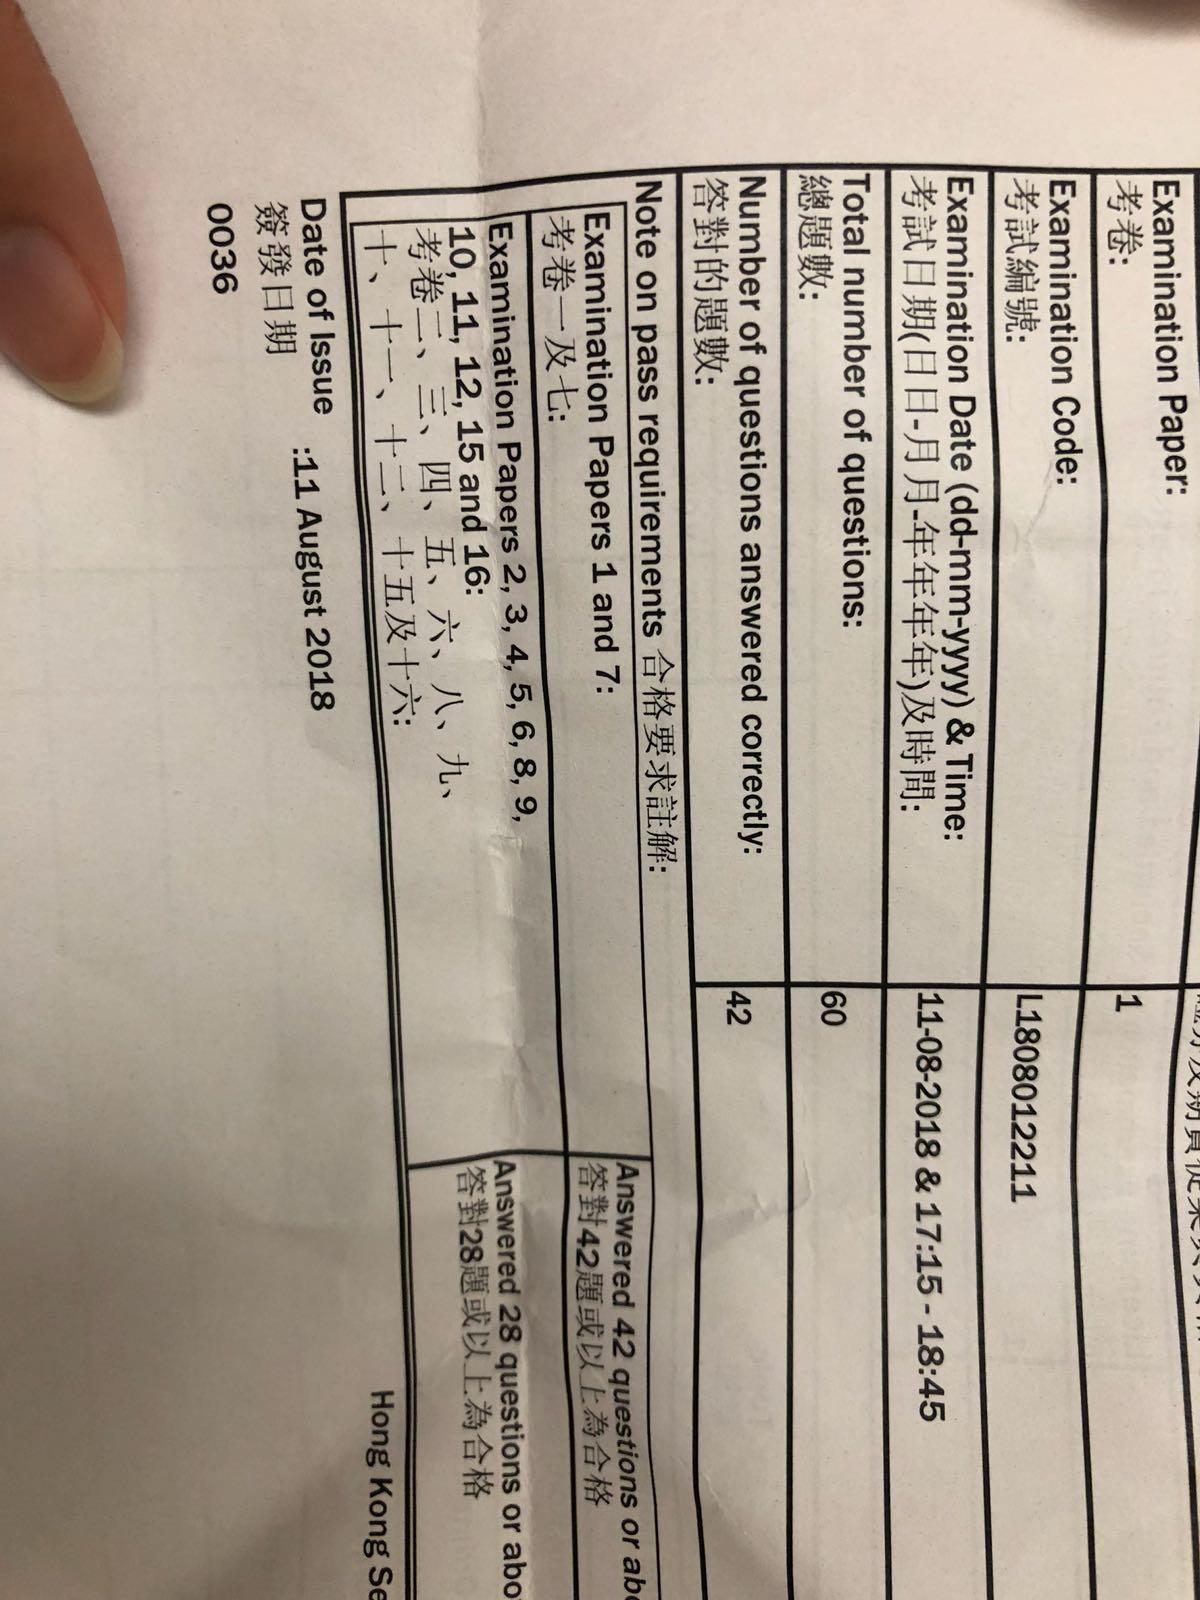 MSS 11/8/2018 LE Paper 1 證券期貨從業員資格考試卷一 Pass